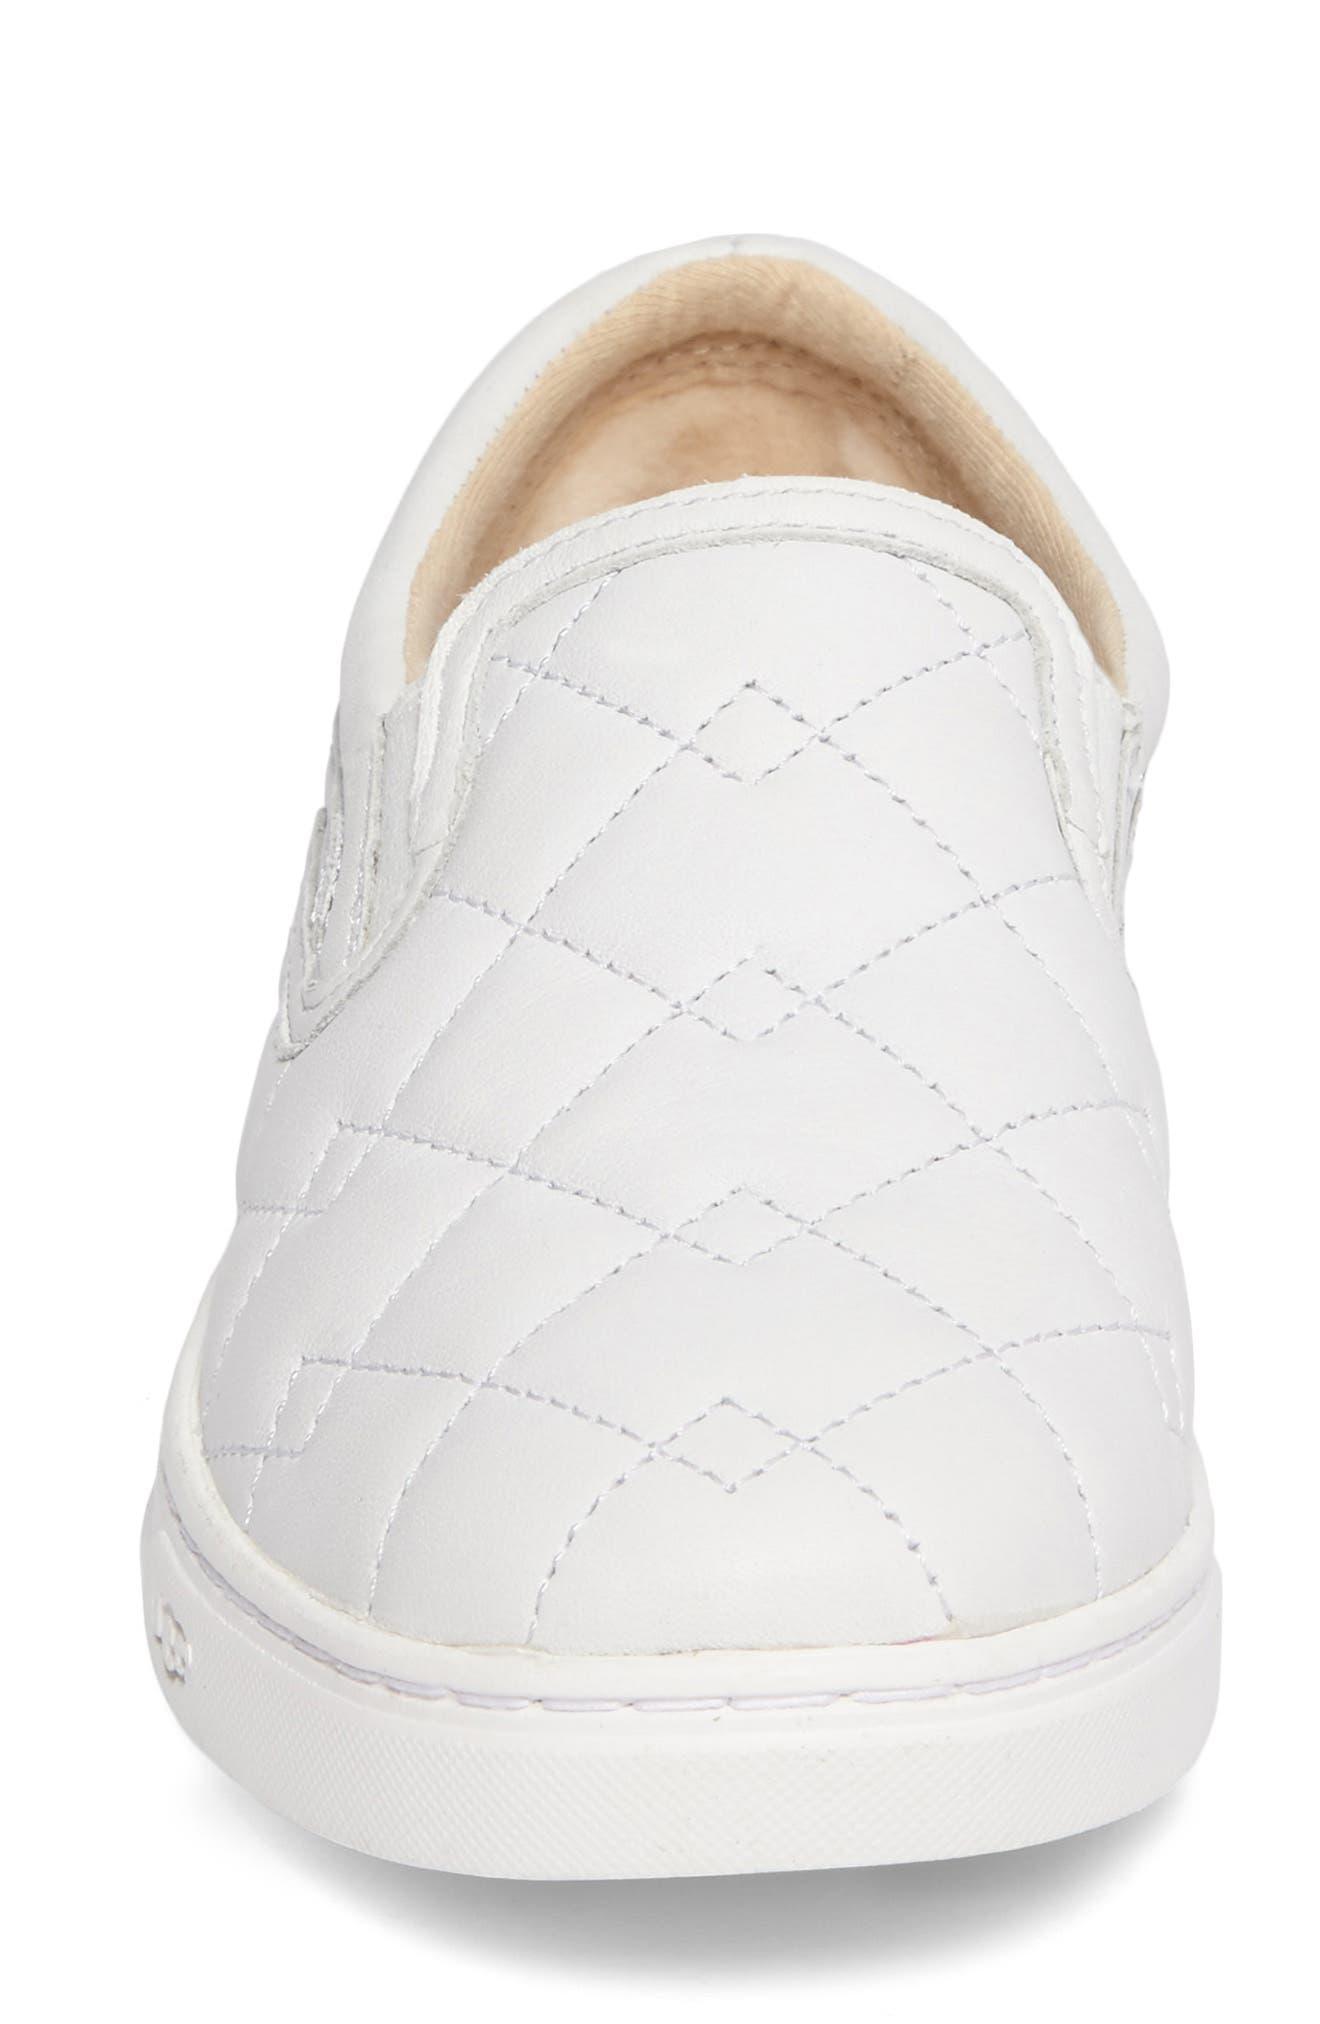 Alternate Image 4  - UGG® Fierce Deco Quilted Slip-On Sneaker (Women)